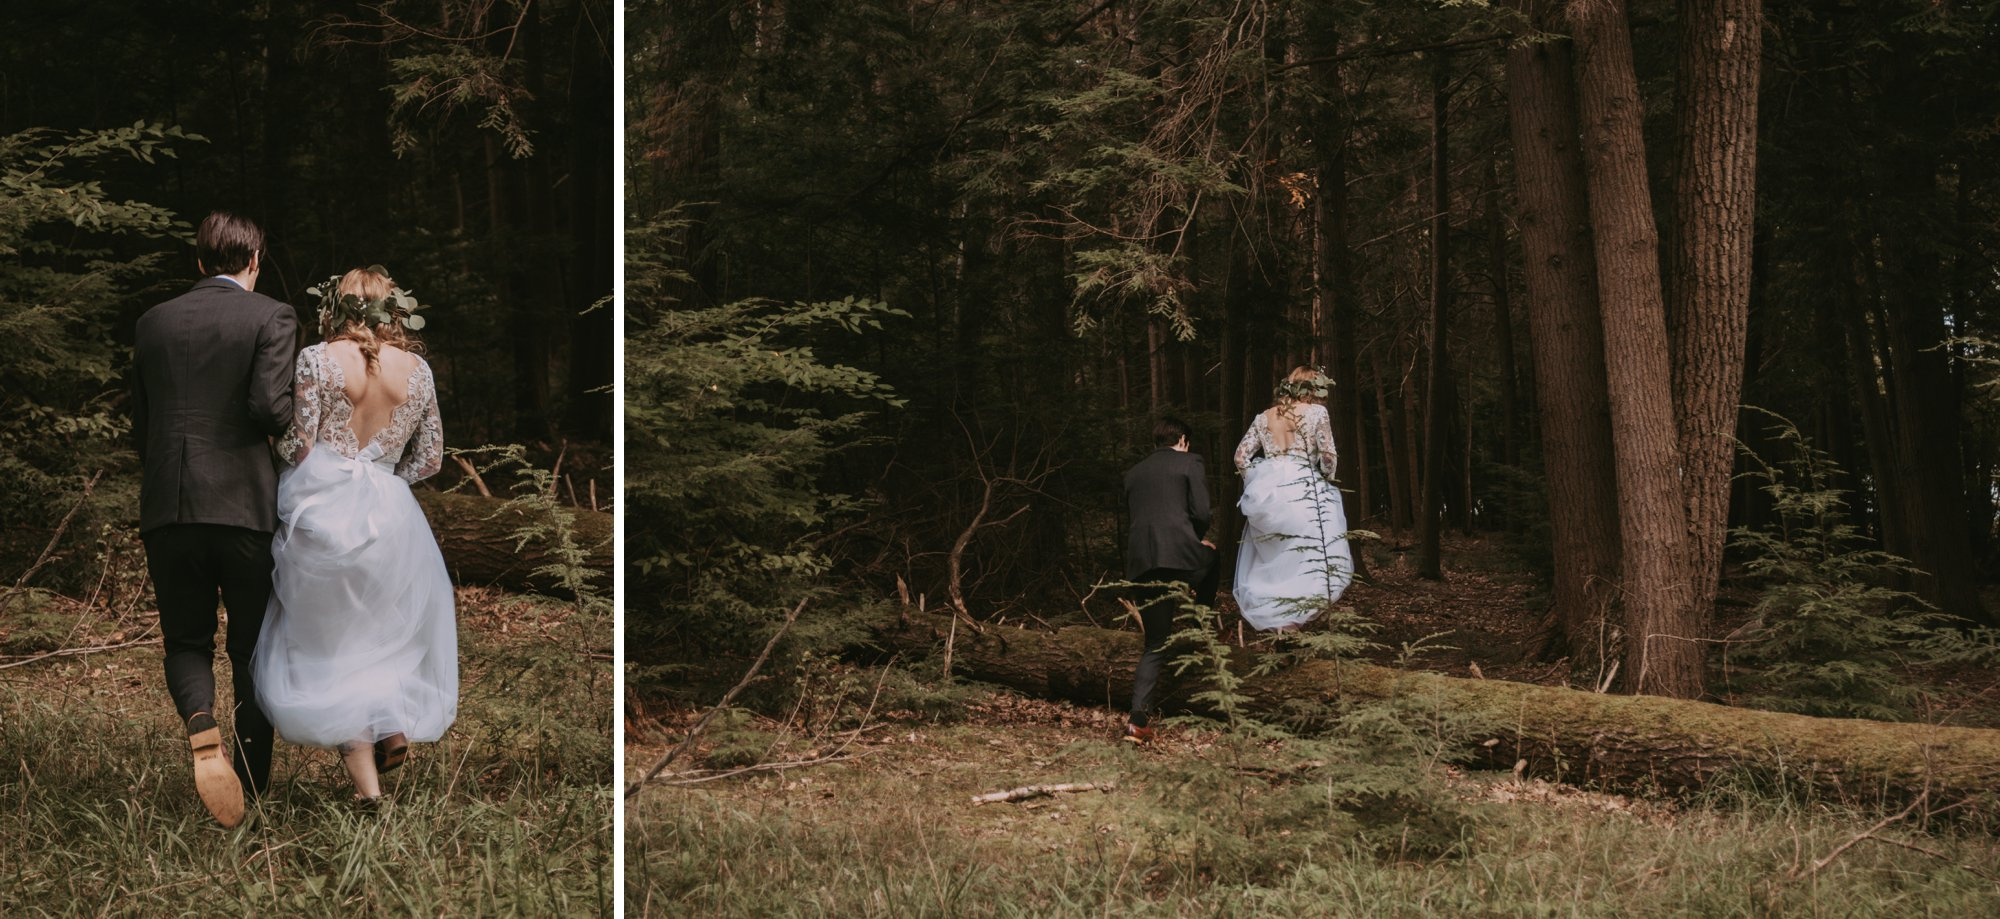 Rustic Intimate Vegan Forest Wedding with Handmade Dress.